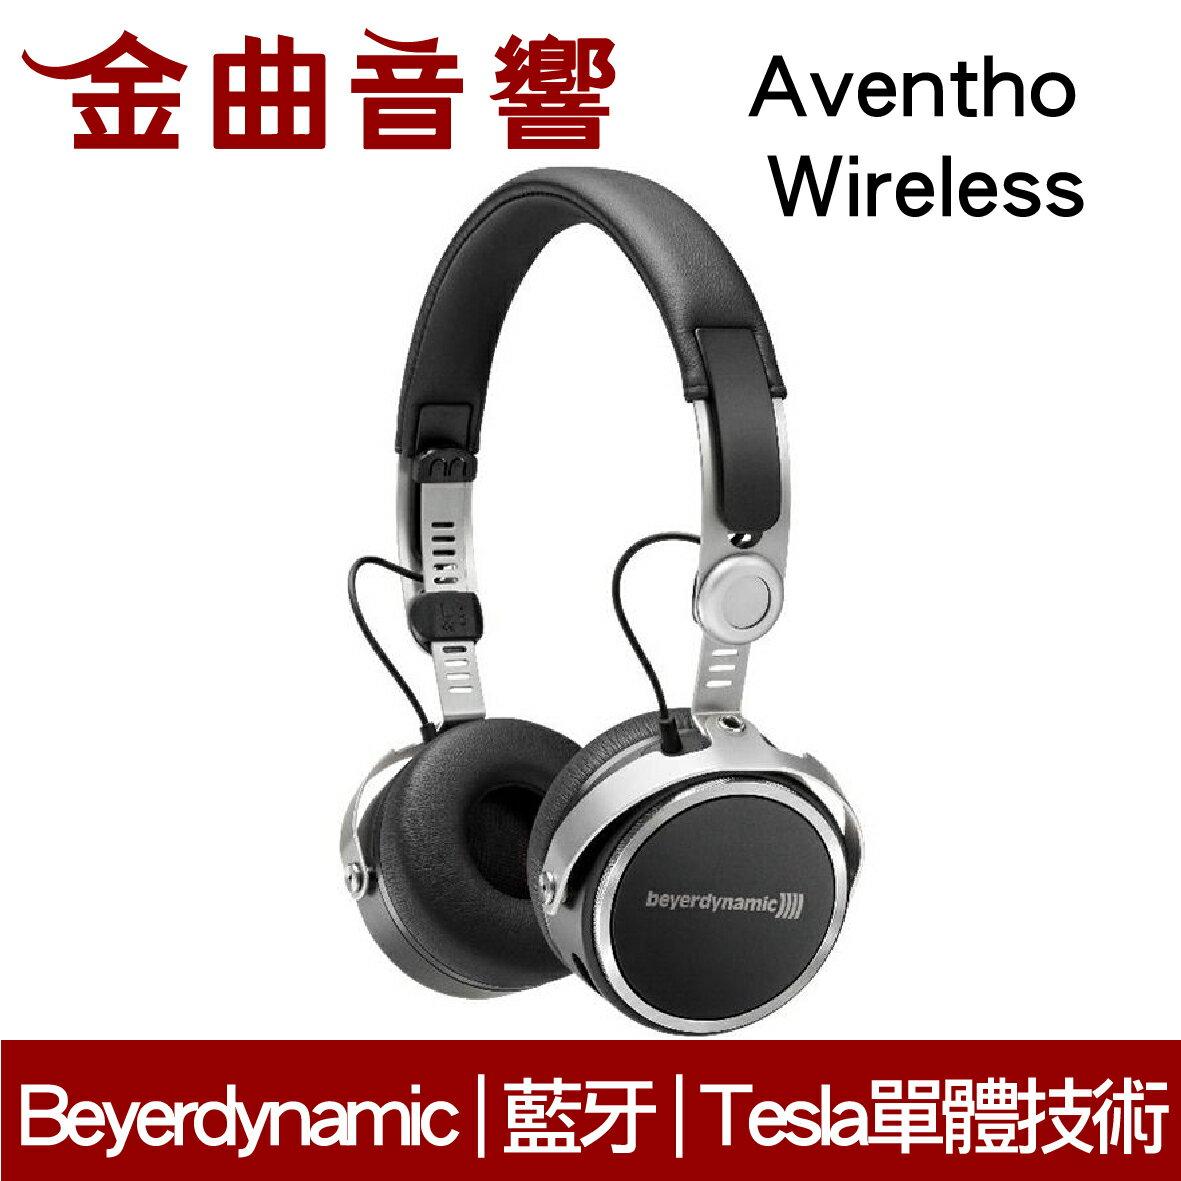 Beyerdynamic 拜耳 Aventho Wireless 黑色 無線 藍牙 耳罩式耳機 | 金曲音響